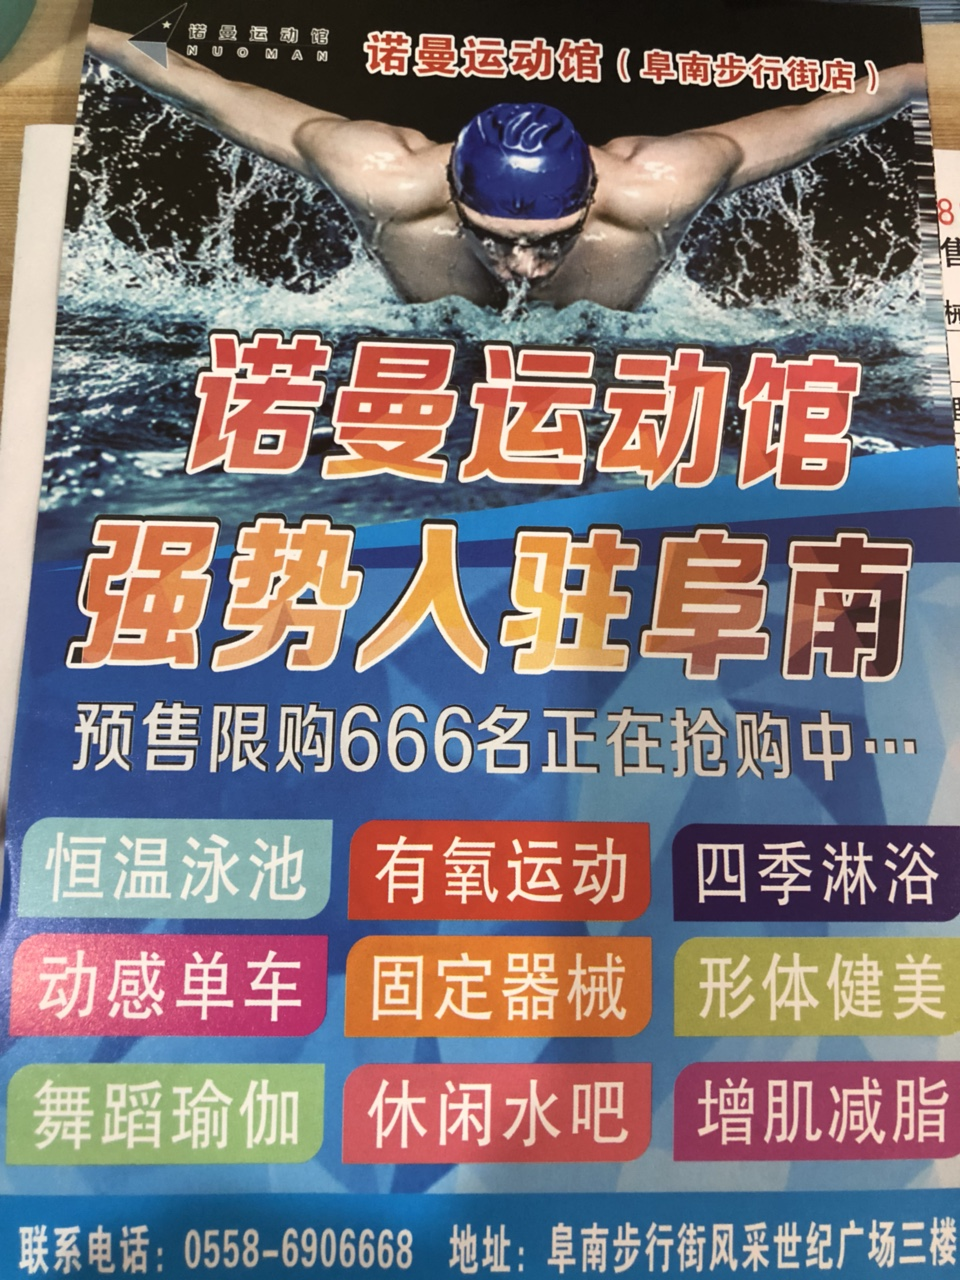 阜南�Z曼游泳健身,9.9�A定���T火爆�A定中